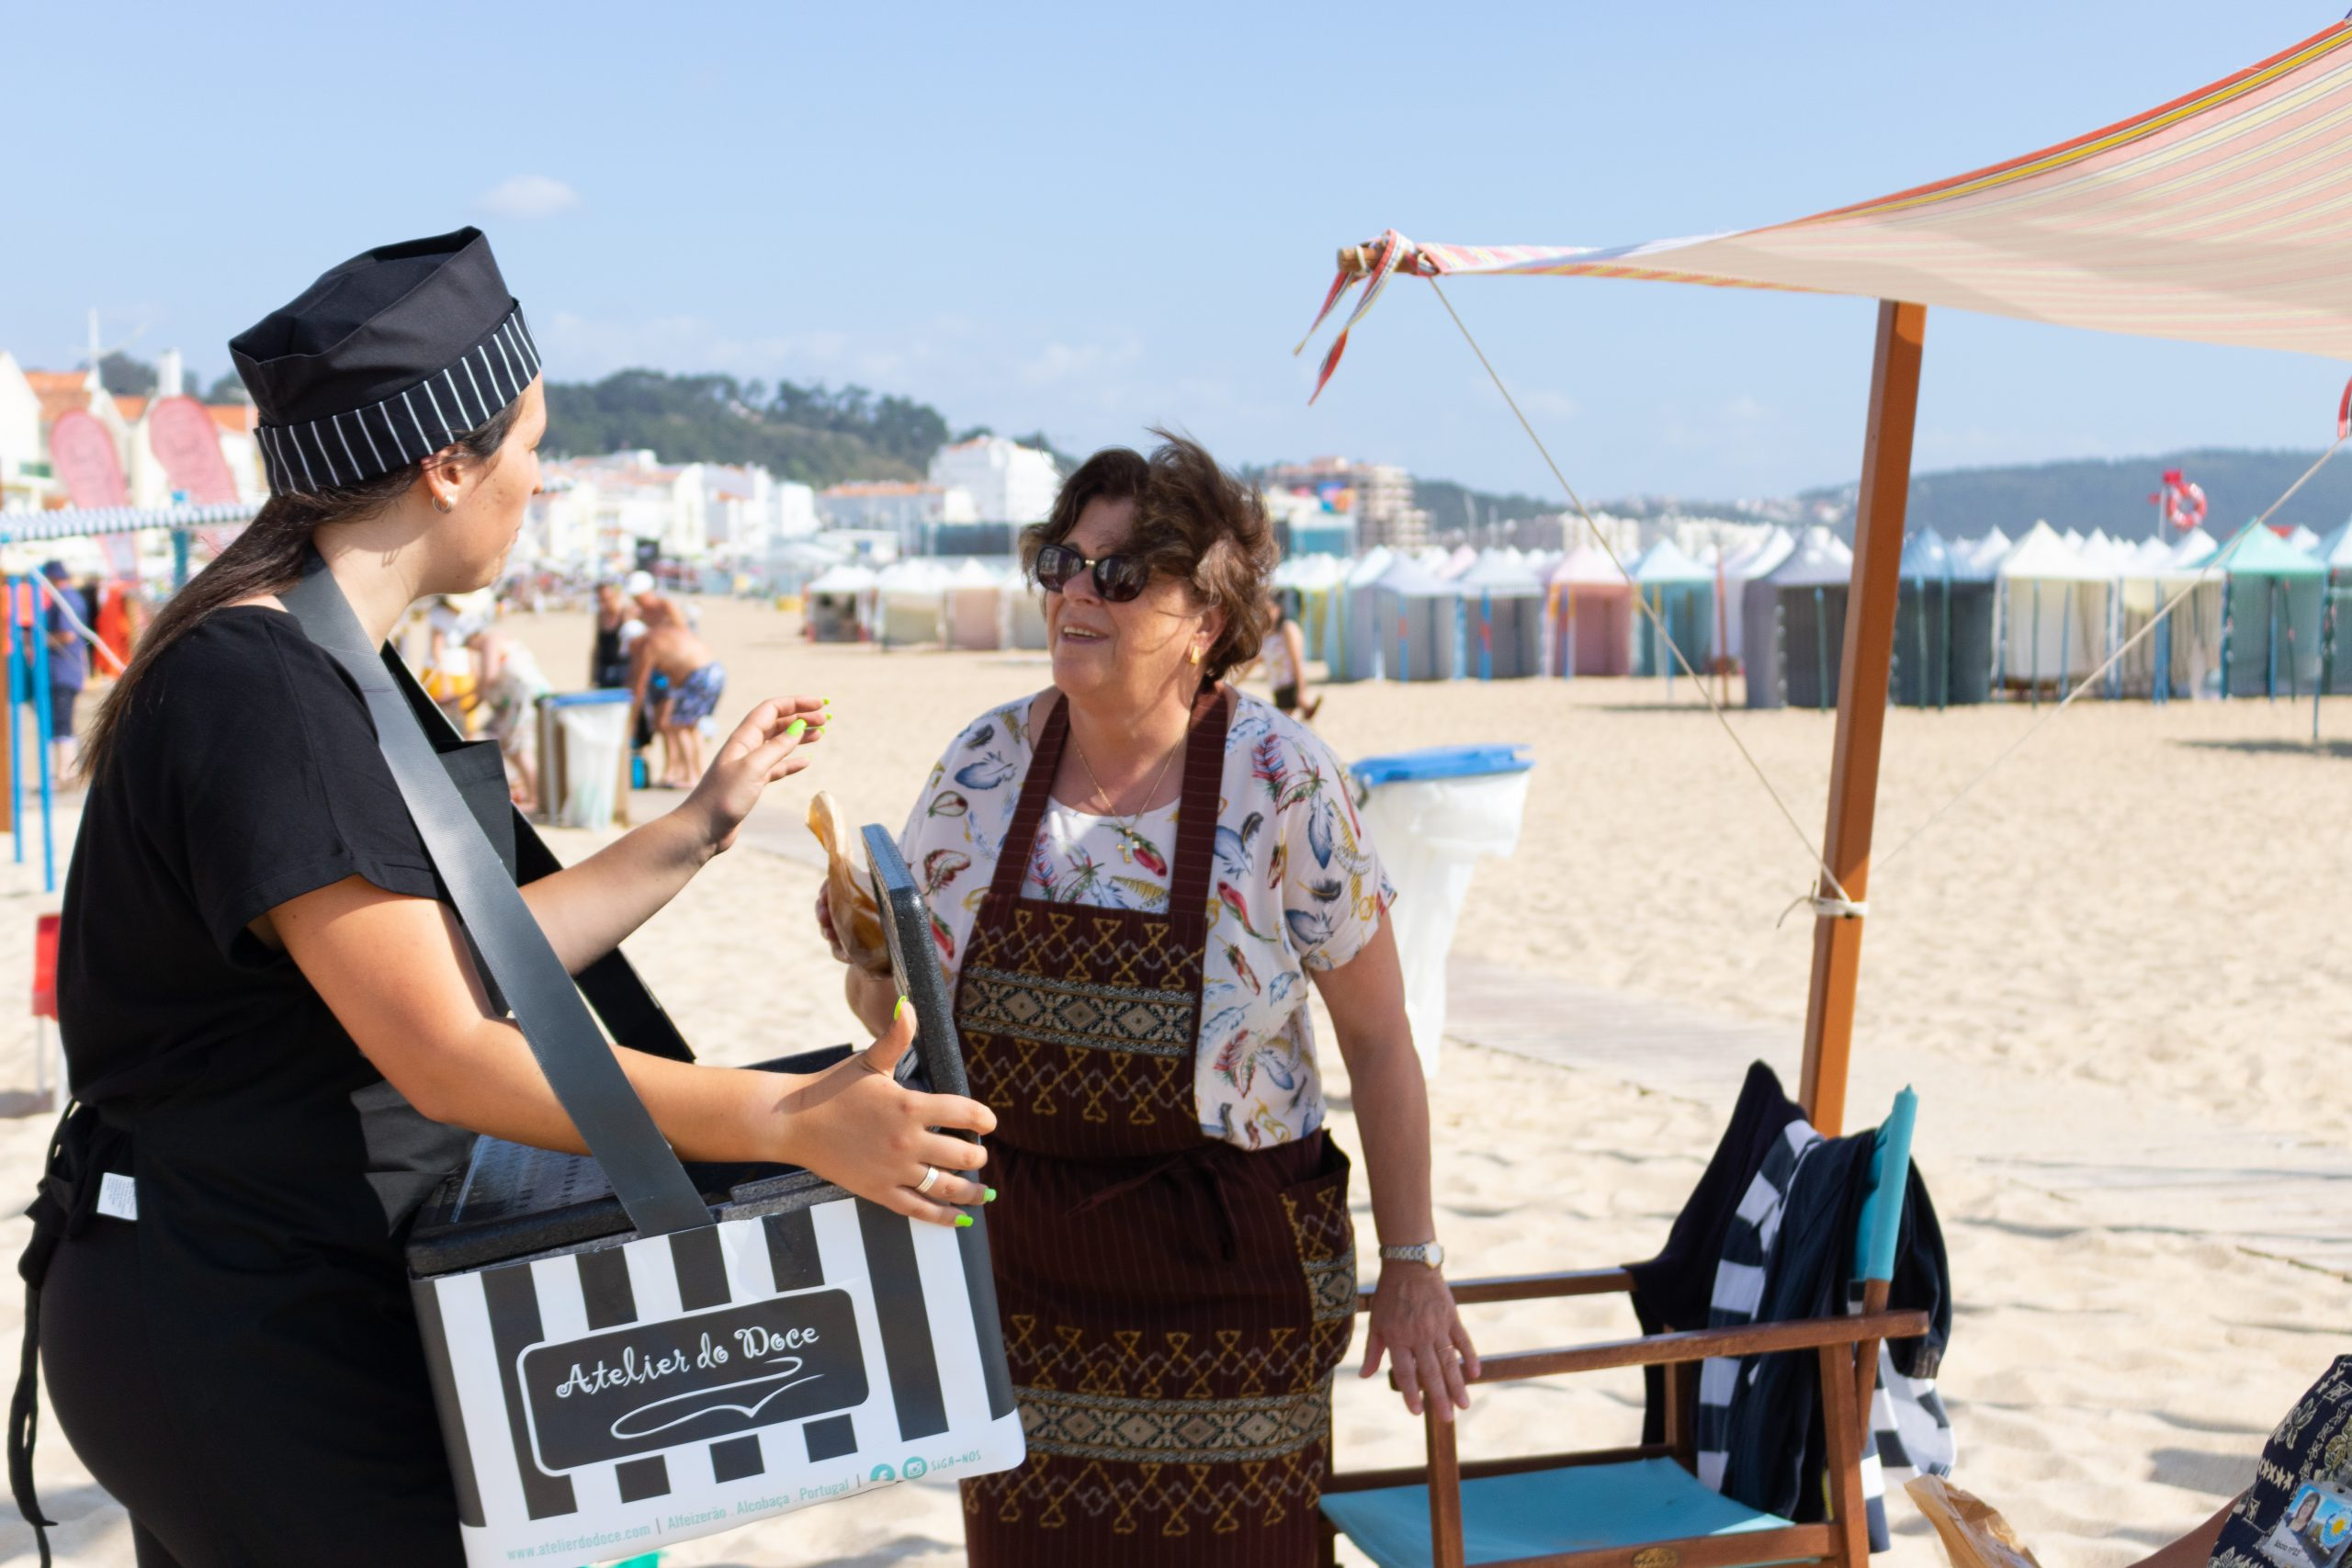 bolas-berlim-praia-atelier-doce-alfeizerao-doces-conventuais